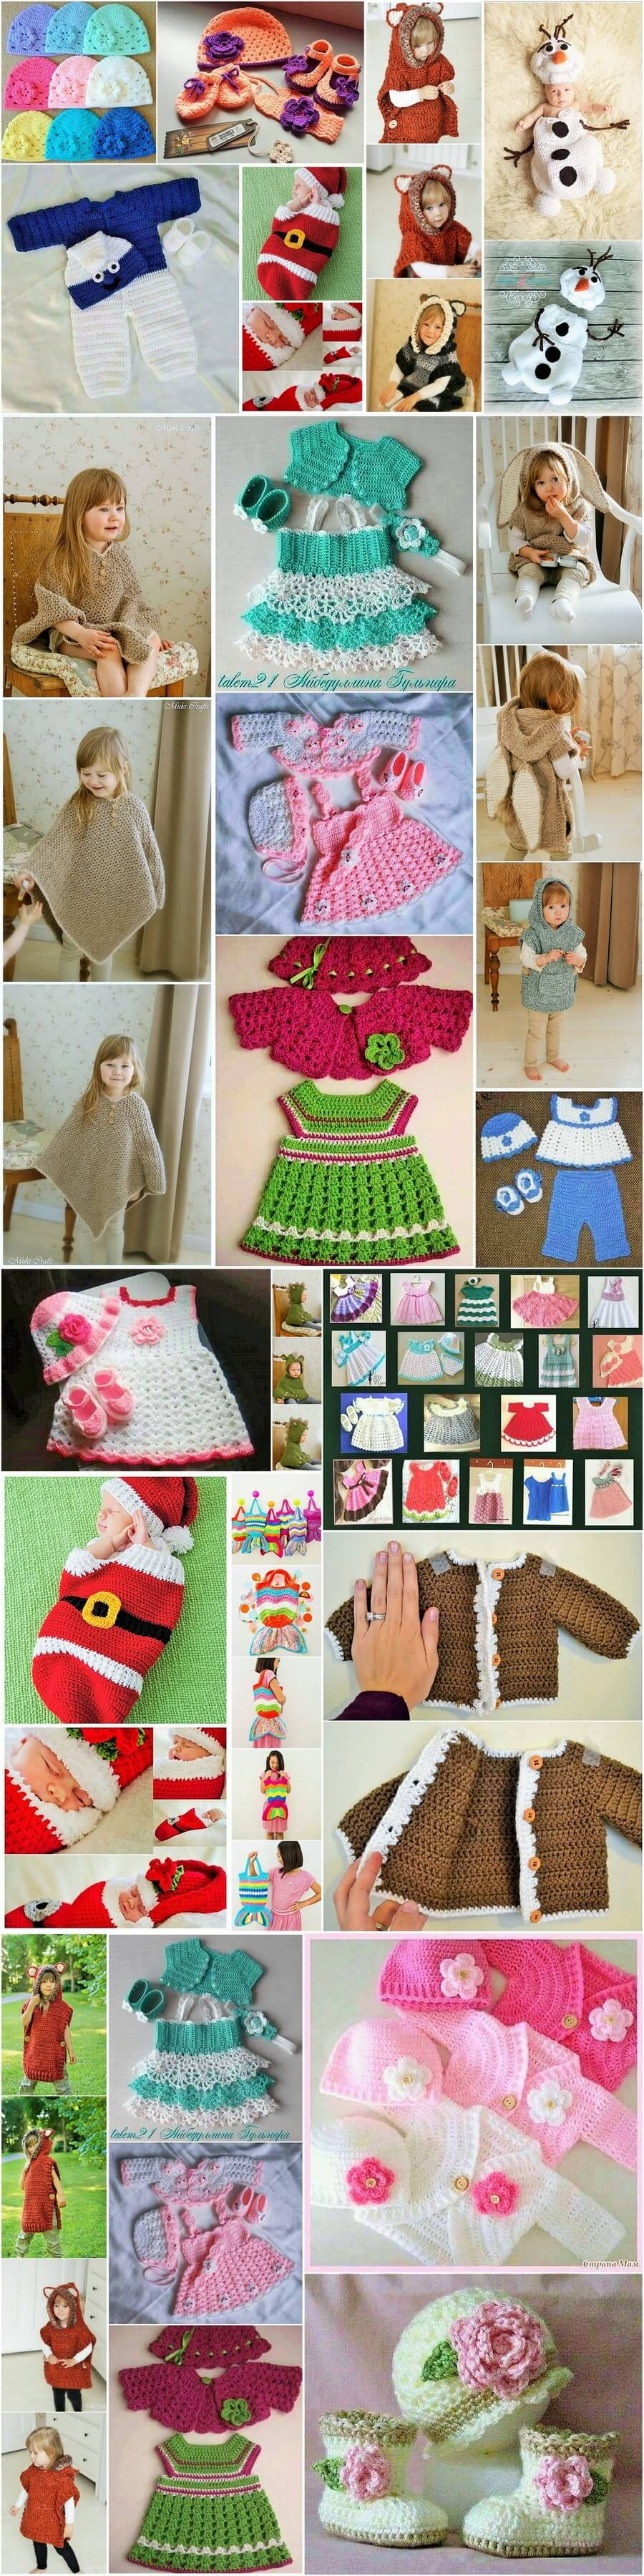 DIY-Homemade- Crochet-Ideas